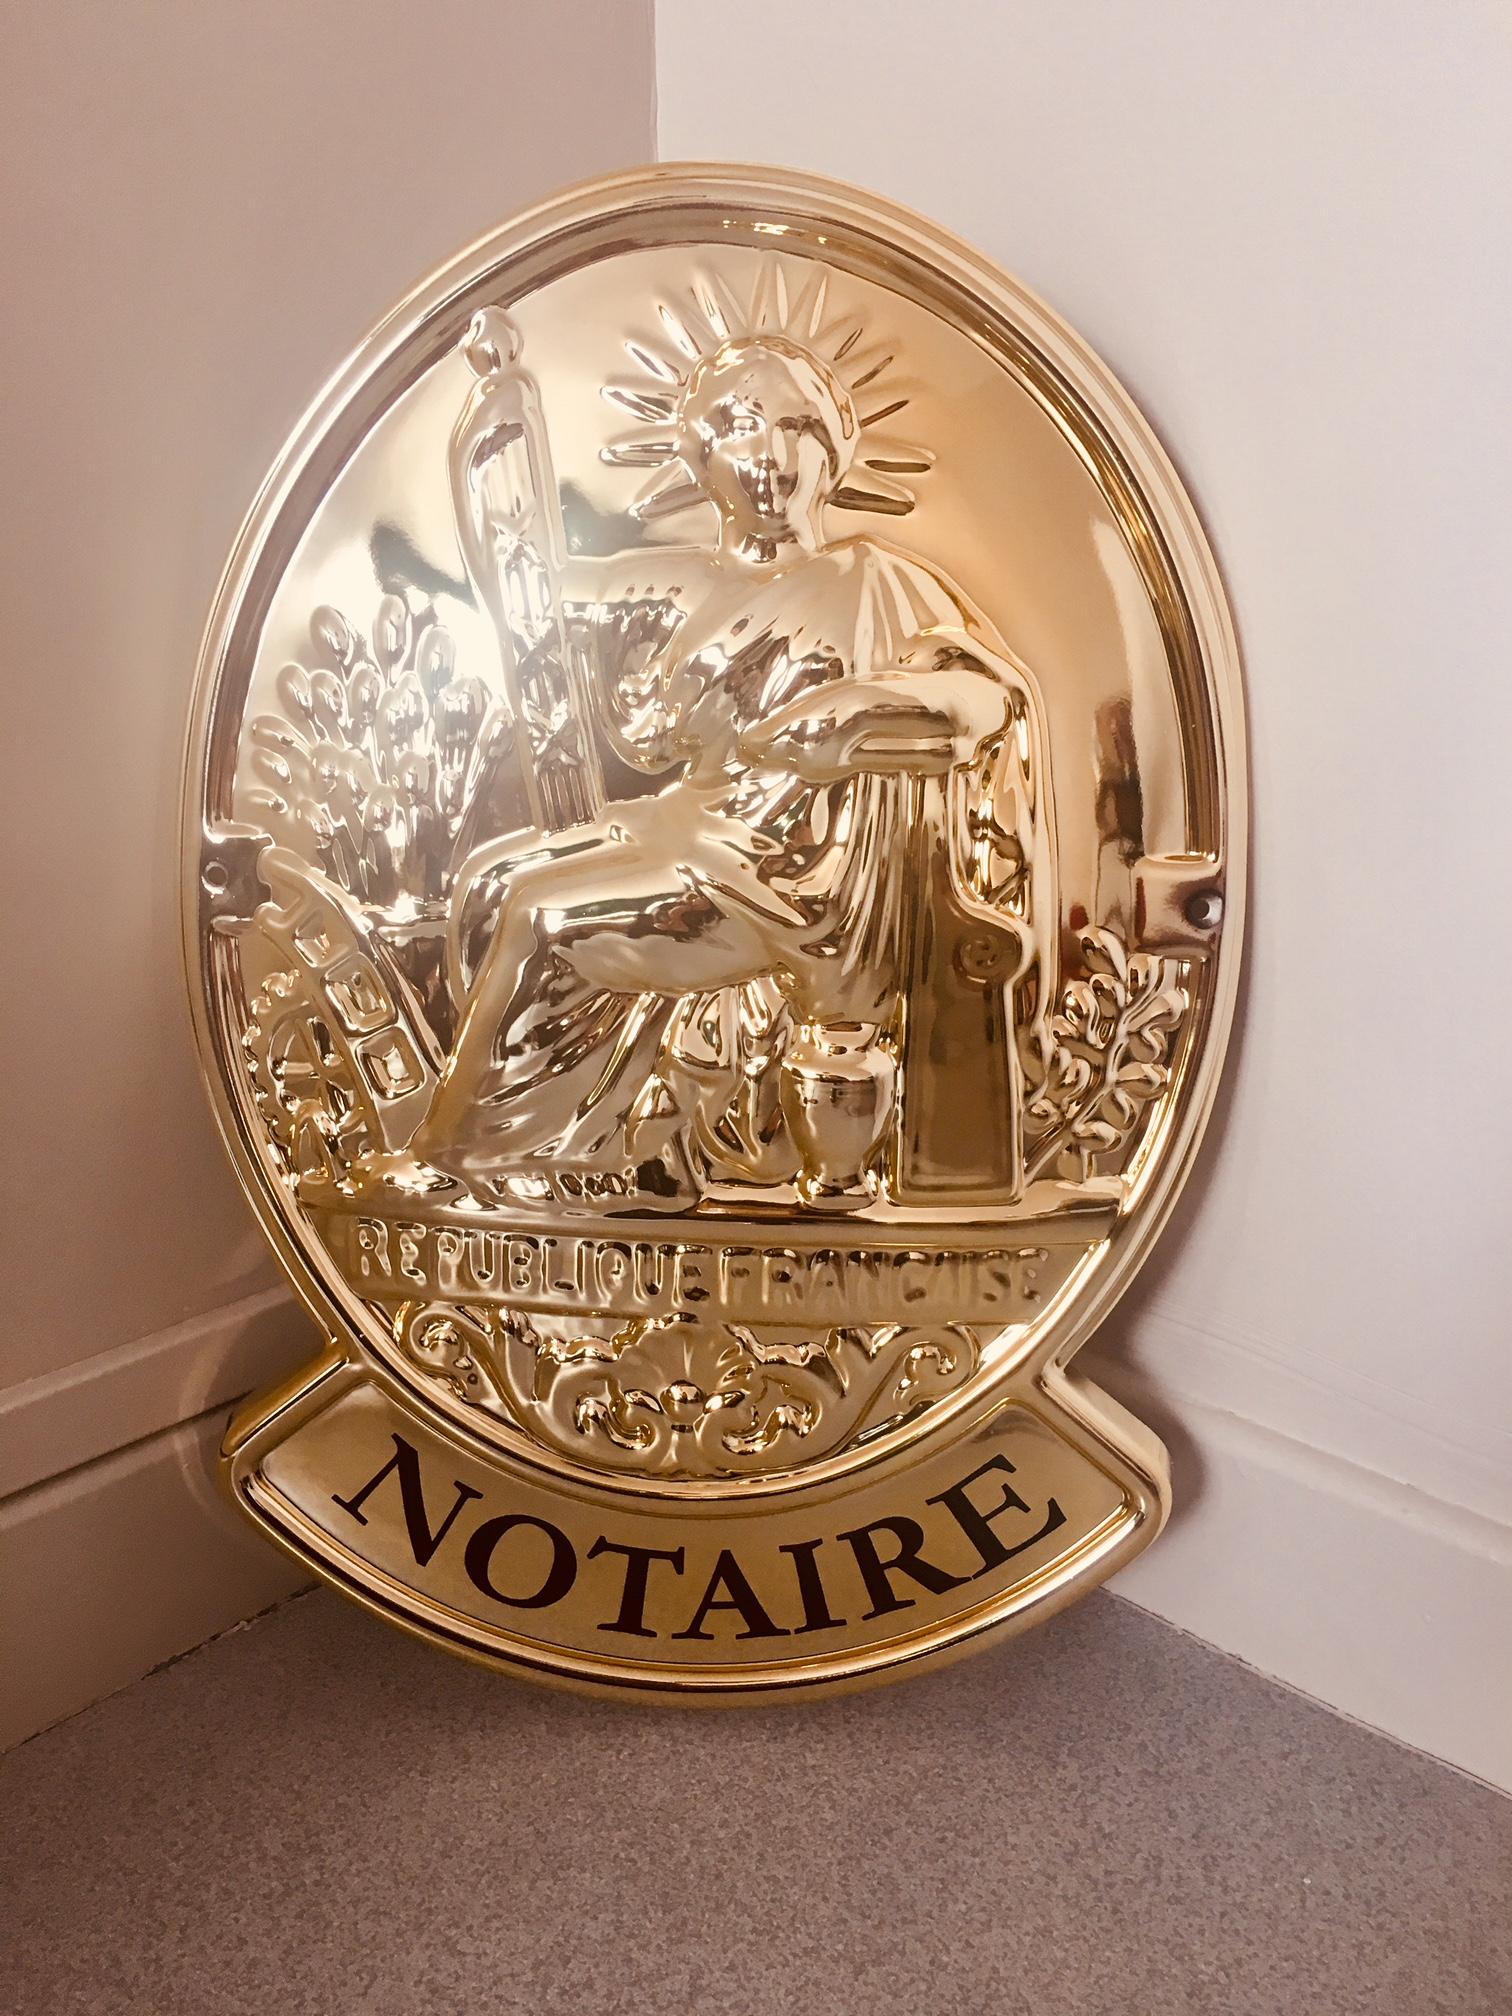 OFFICE Notarial Maître Audrey HUMBERT Notaire GAUCHY 02